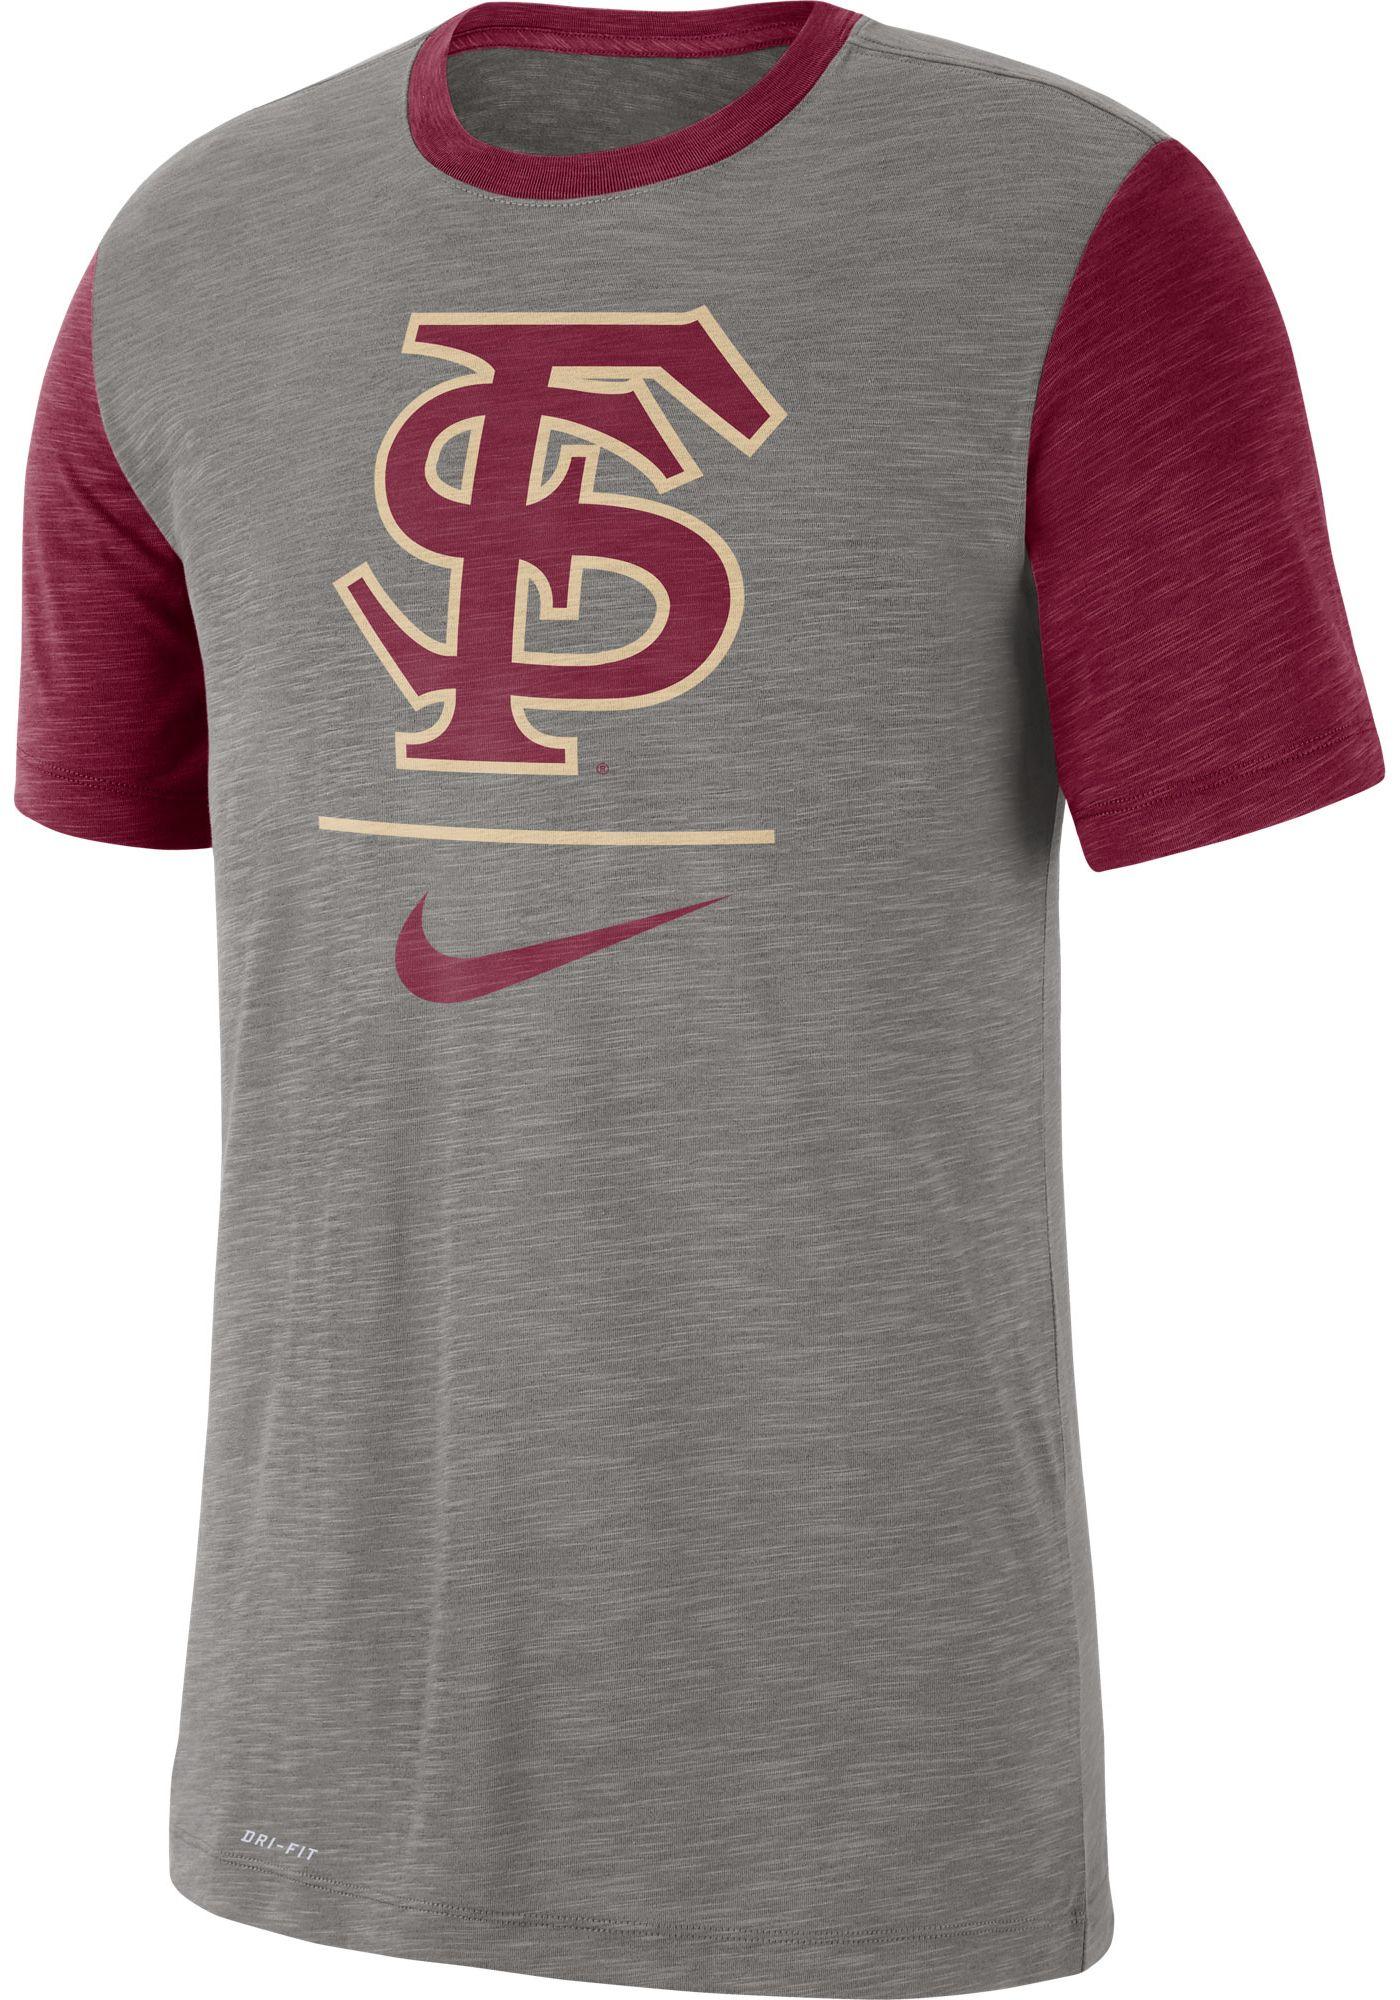 Nike Men's Florida State Seminoles Grey Dri-FIT Baseball Slub T-Shirt